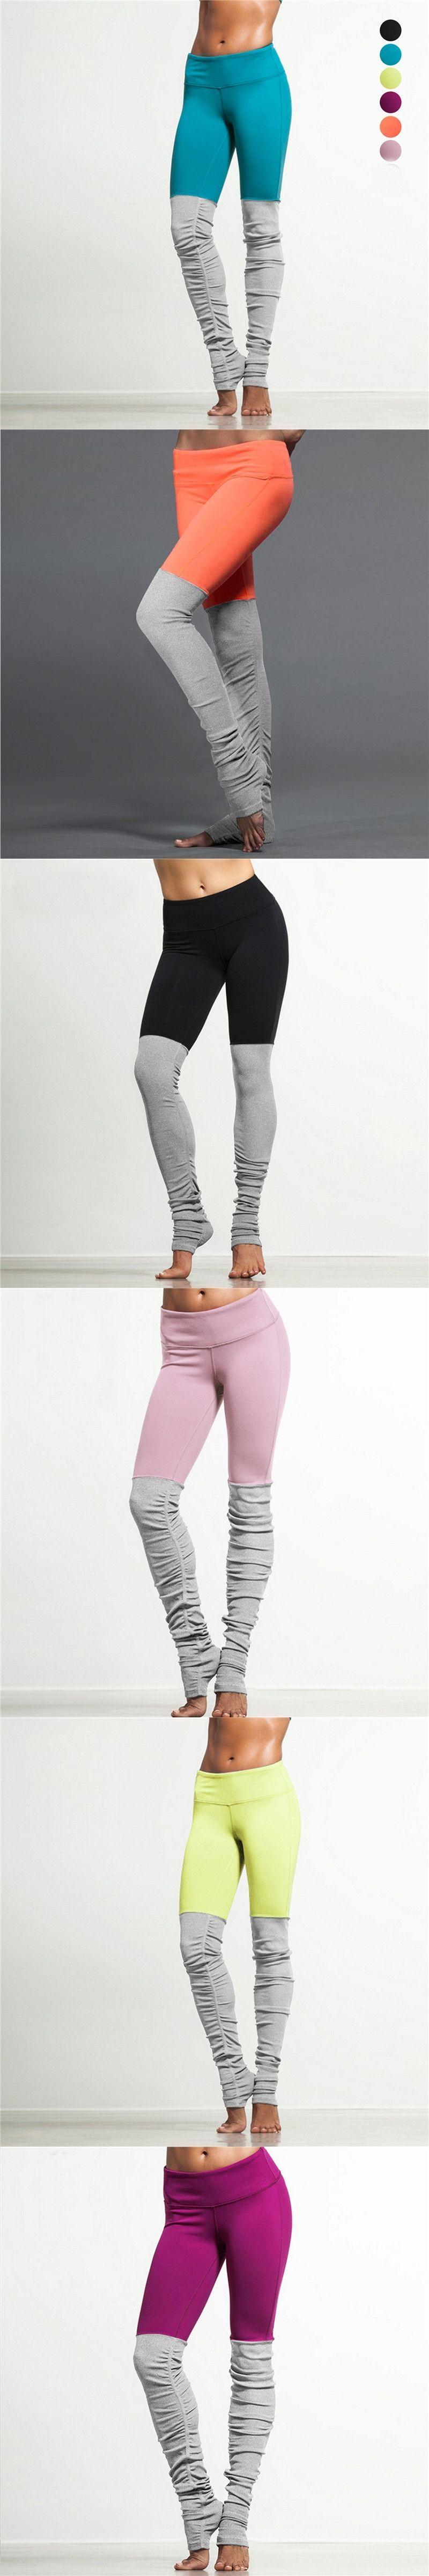 cb53cb47bedf4c High Waist Women Yoga Pants 3D Printed Fitness Leggings Jogging Sport Capris  Plus Size Tights Workout